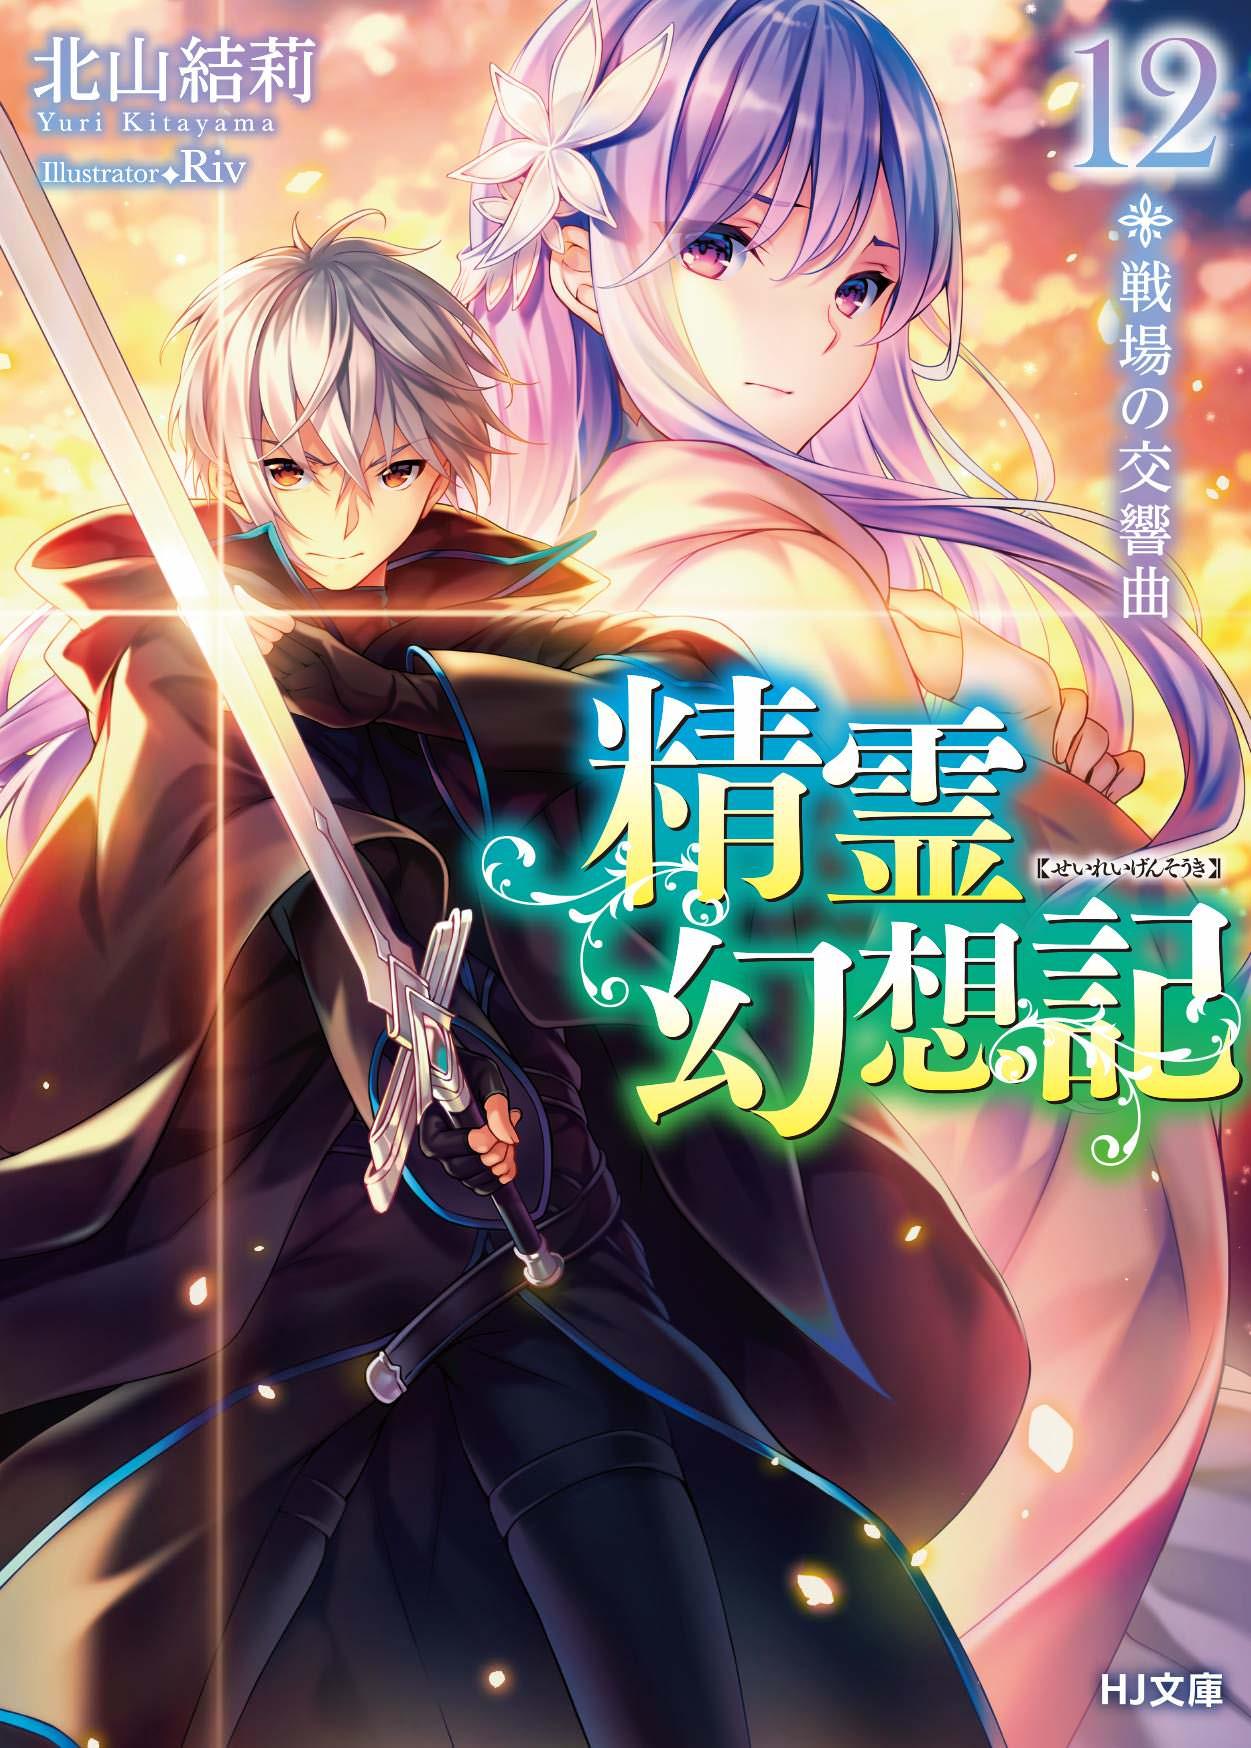 ACT 12 - Symphony of the Battlefield | Seirei Gensouki